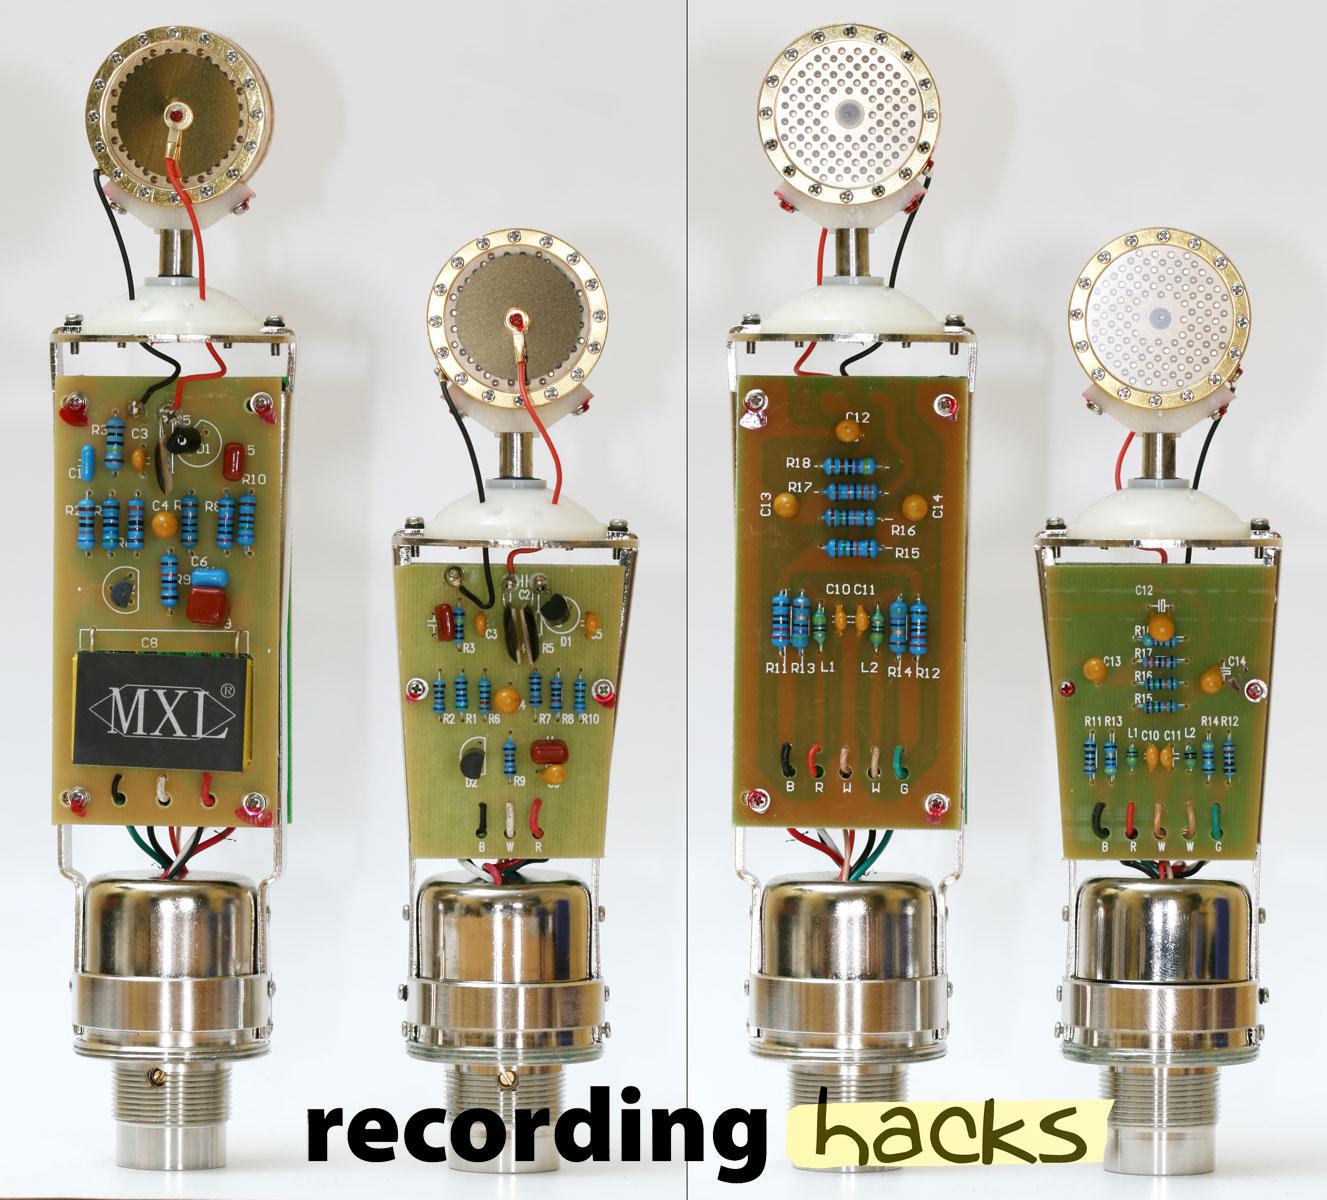 MXL 3000   RecordingHacks.com